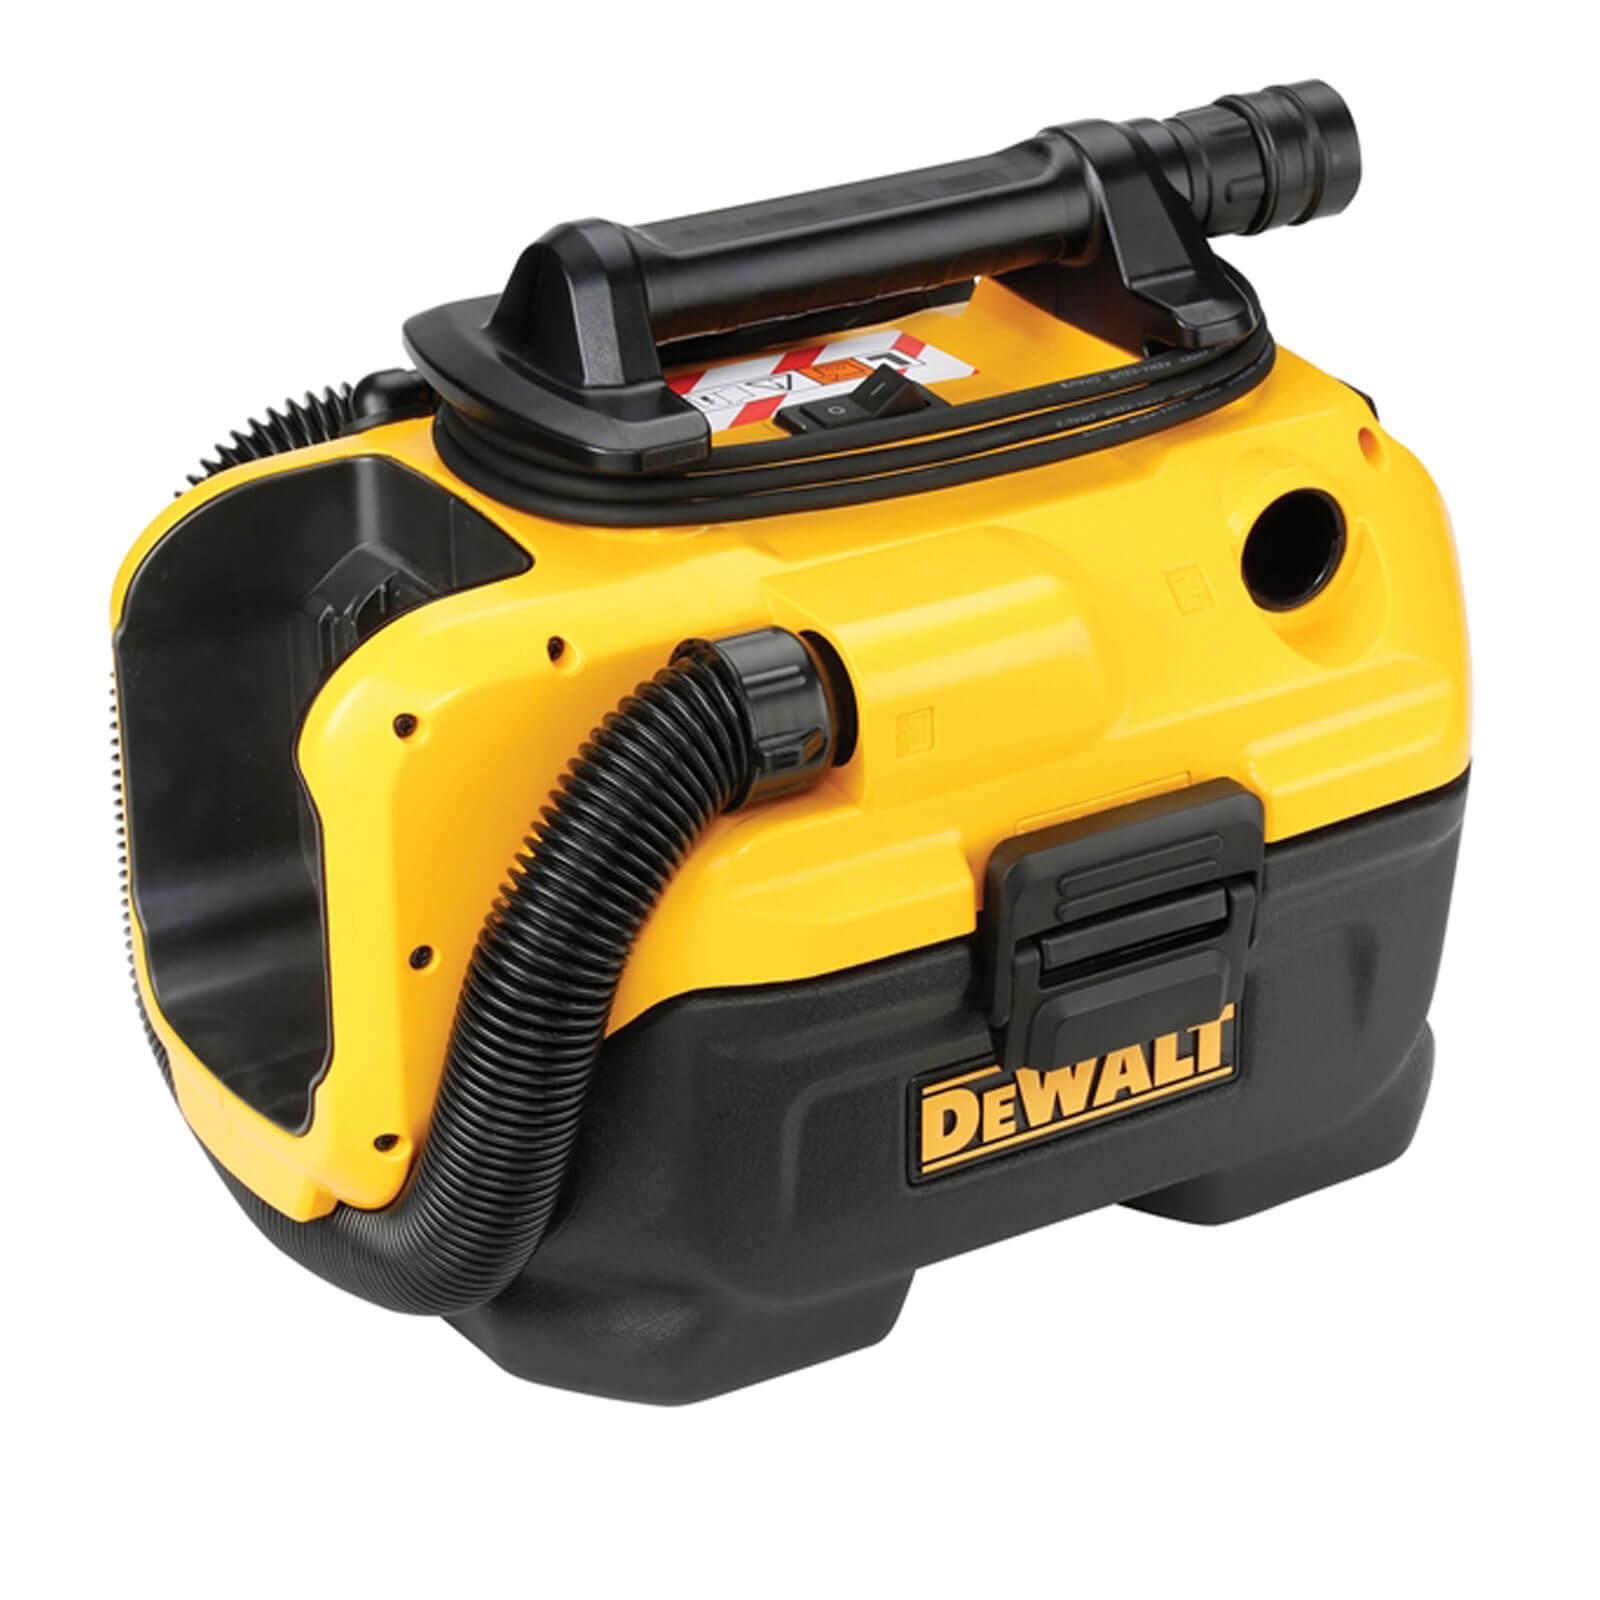 Image of Dewalt DCV584L Cordless XR FLEXVOLT L Class Vacuum Cleaner without Battery or Charger